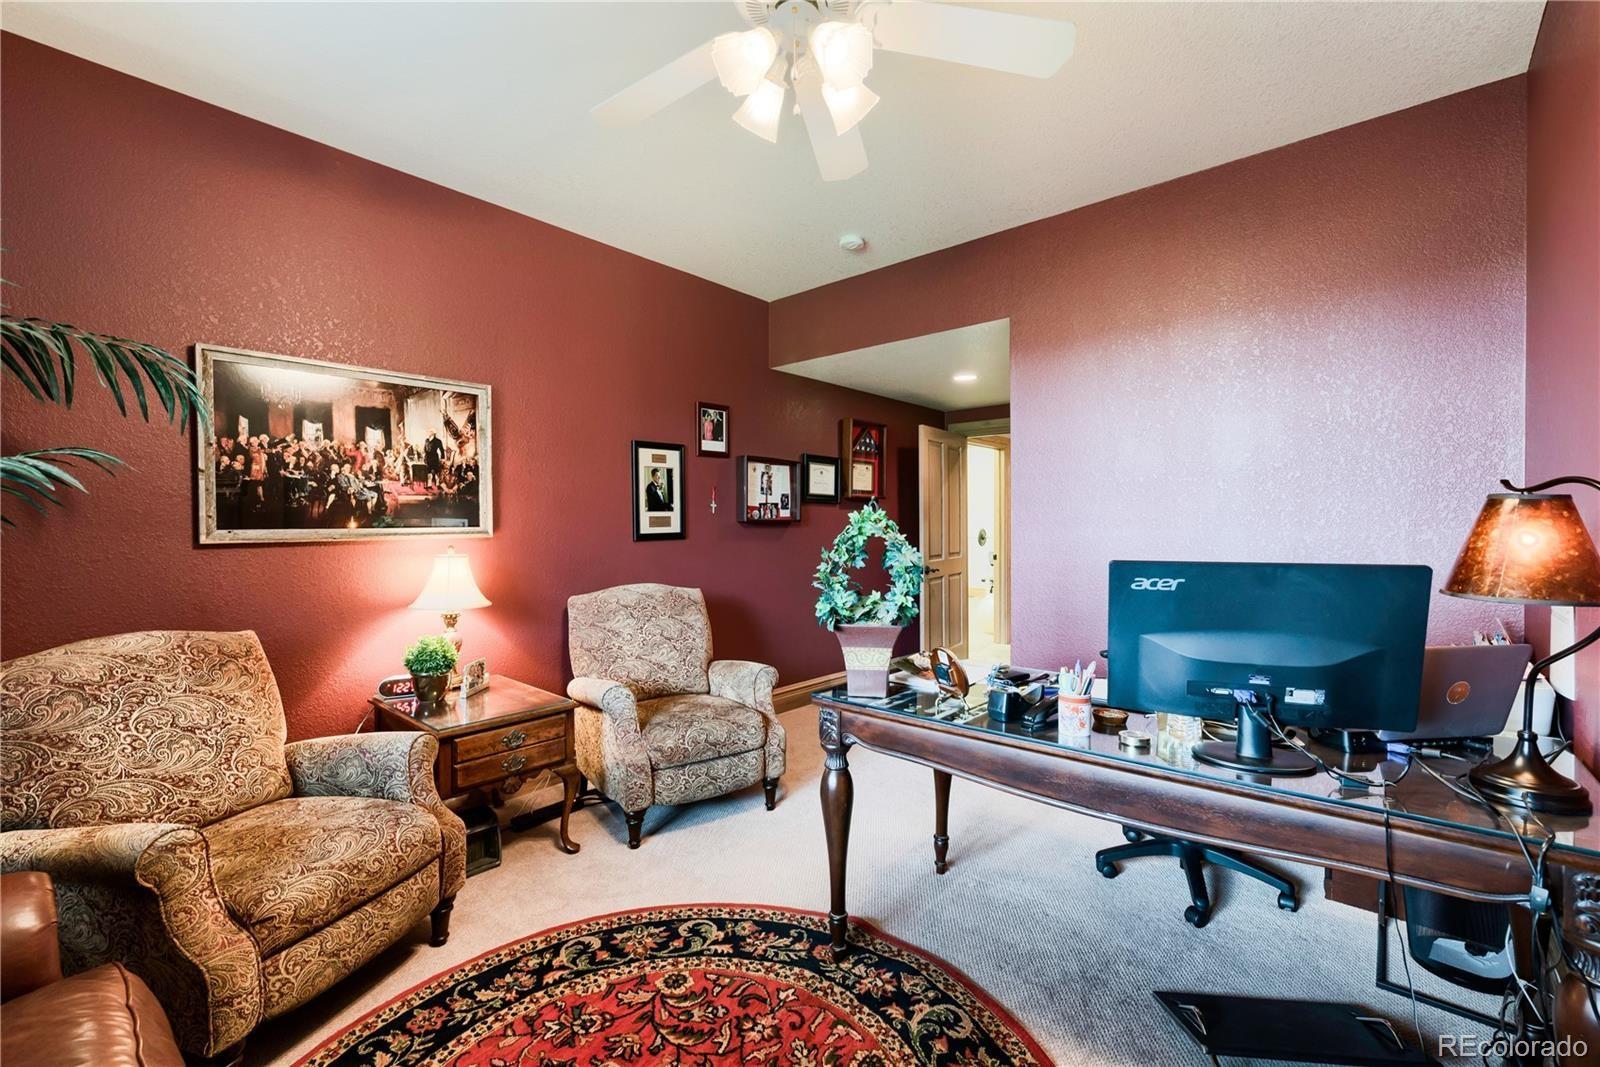 MLS# 2964584 - 32 - 5730 Ridgeway Drive, Fort Collins, CO 80528